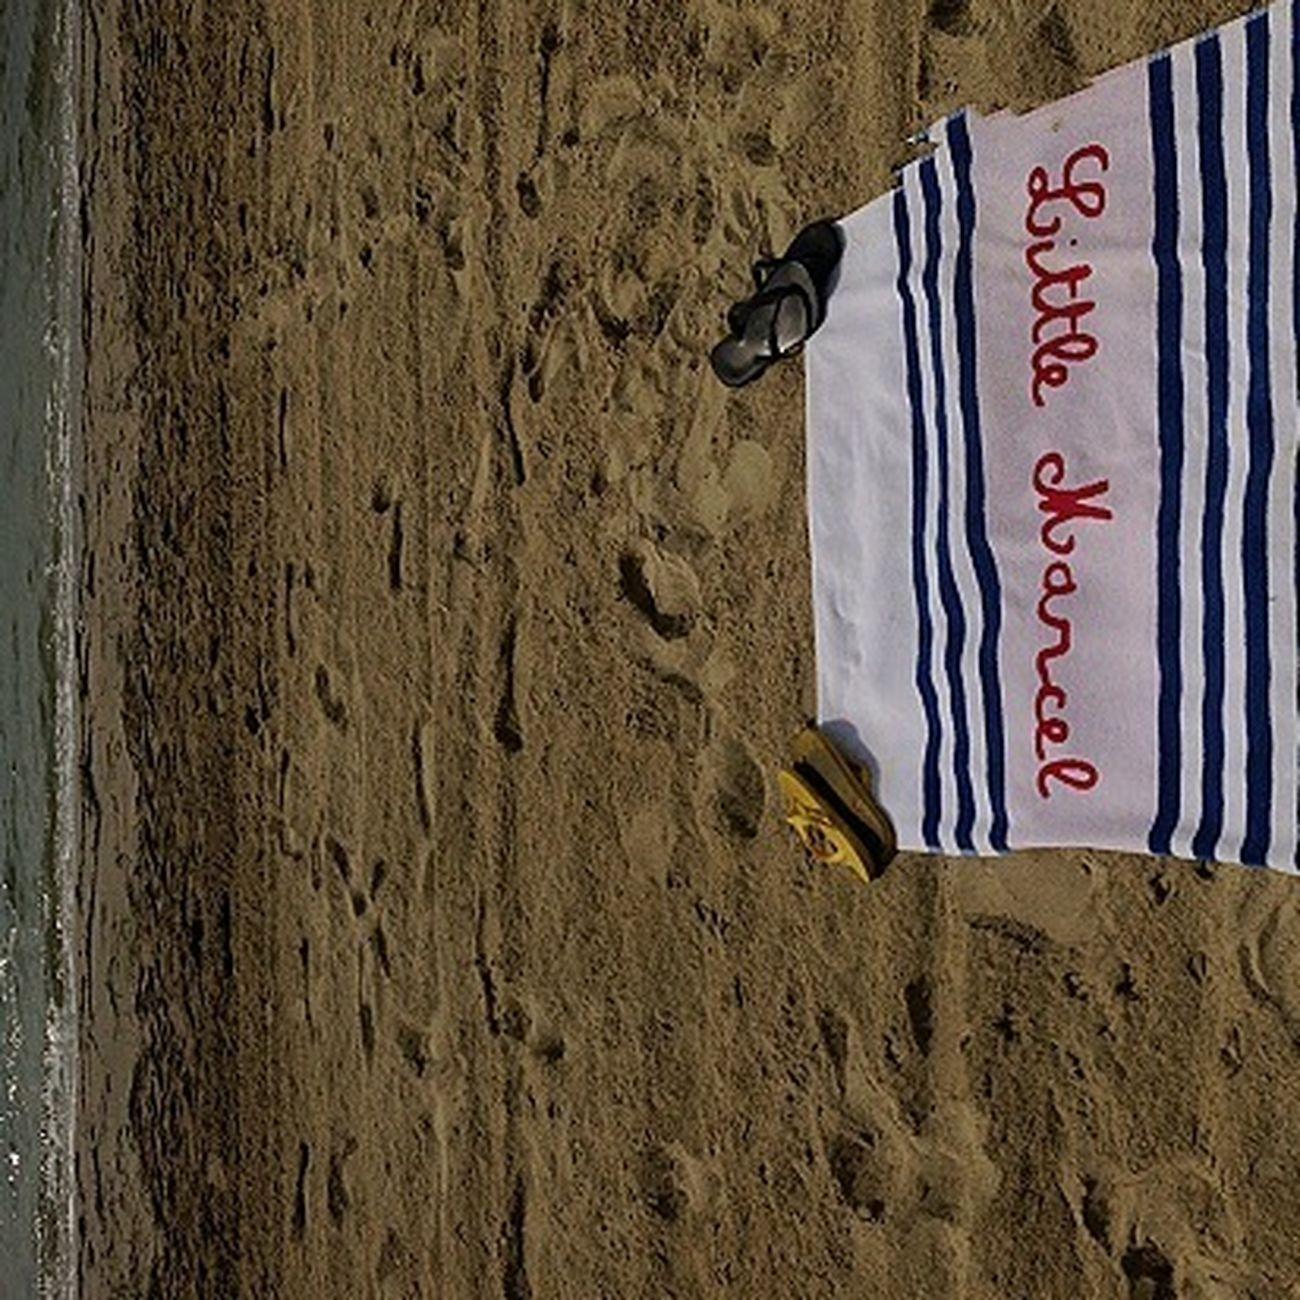 seuls au monde, plage privee